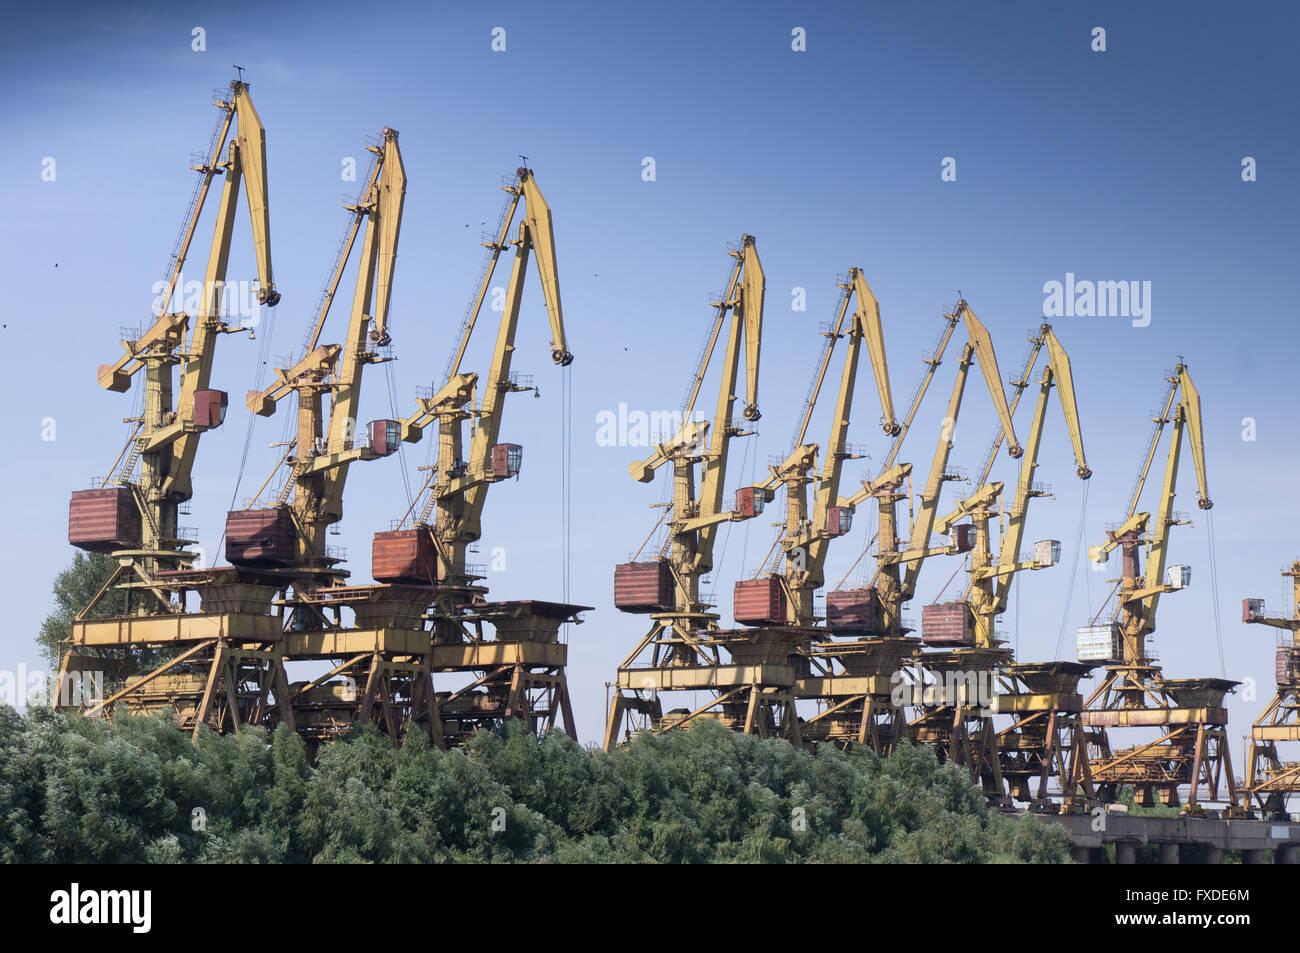 Many Cranes On The Shipyard In Galati